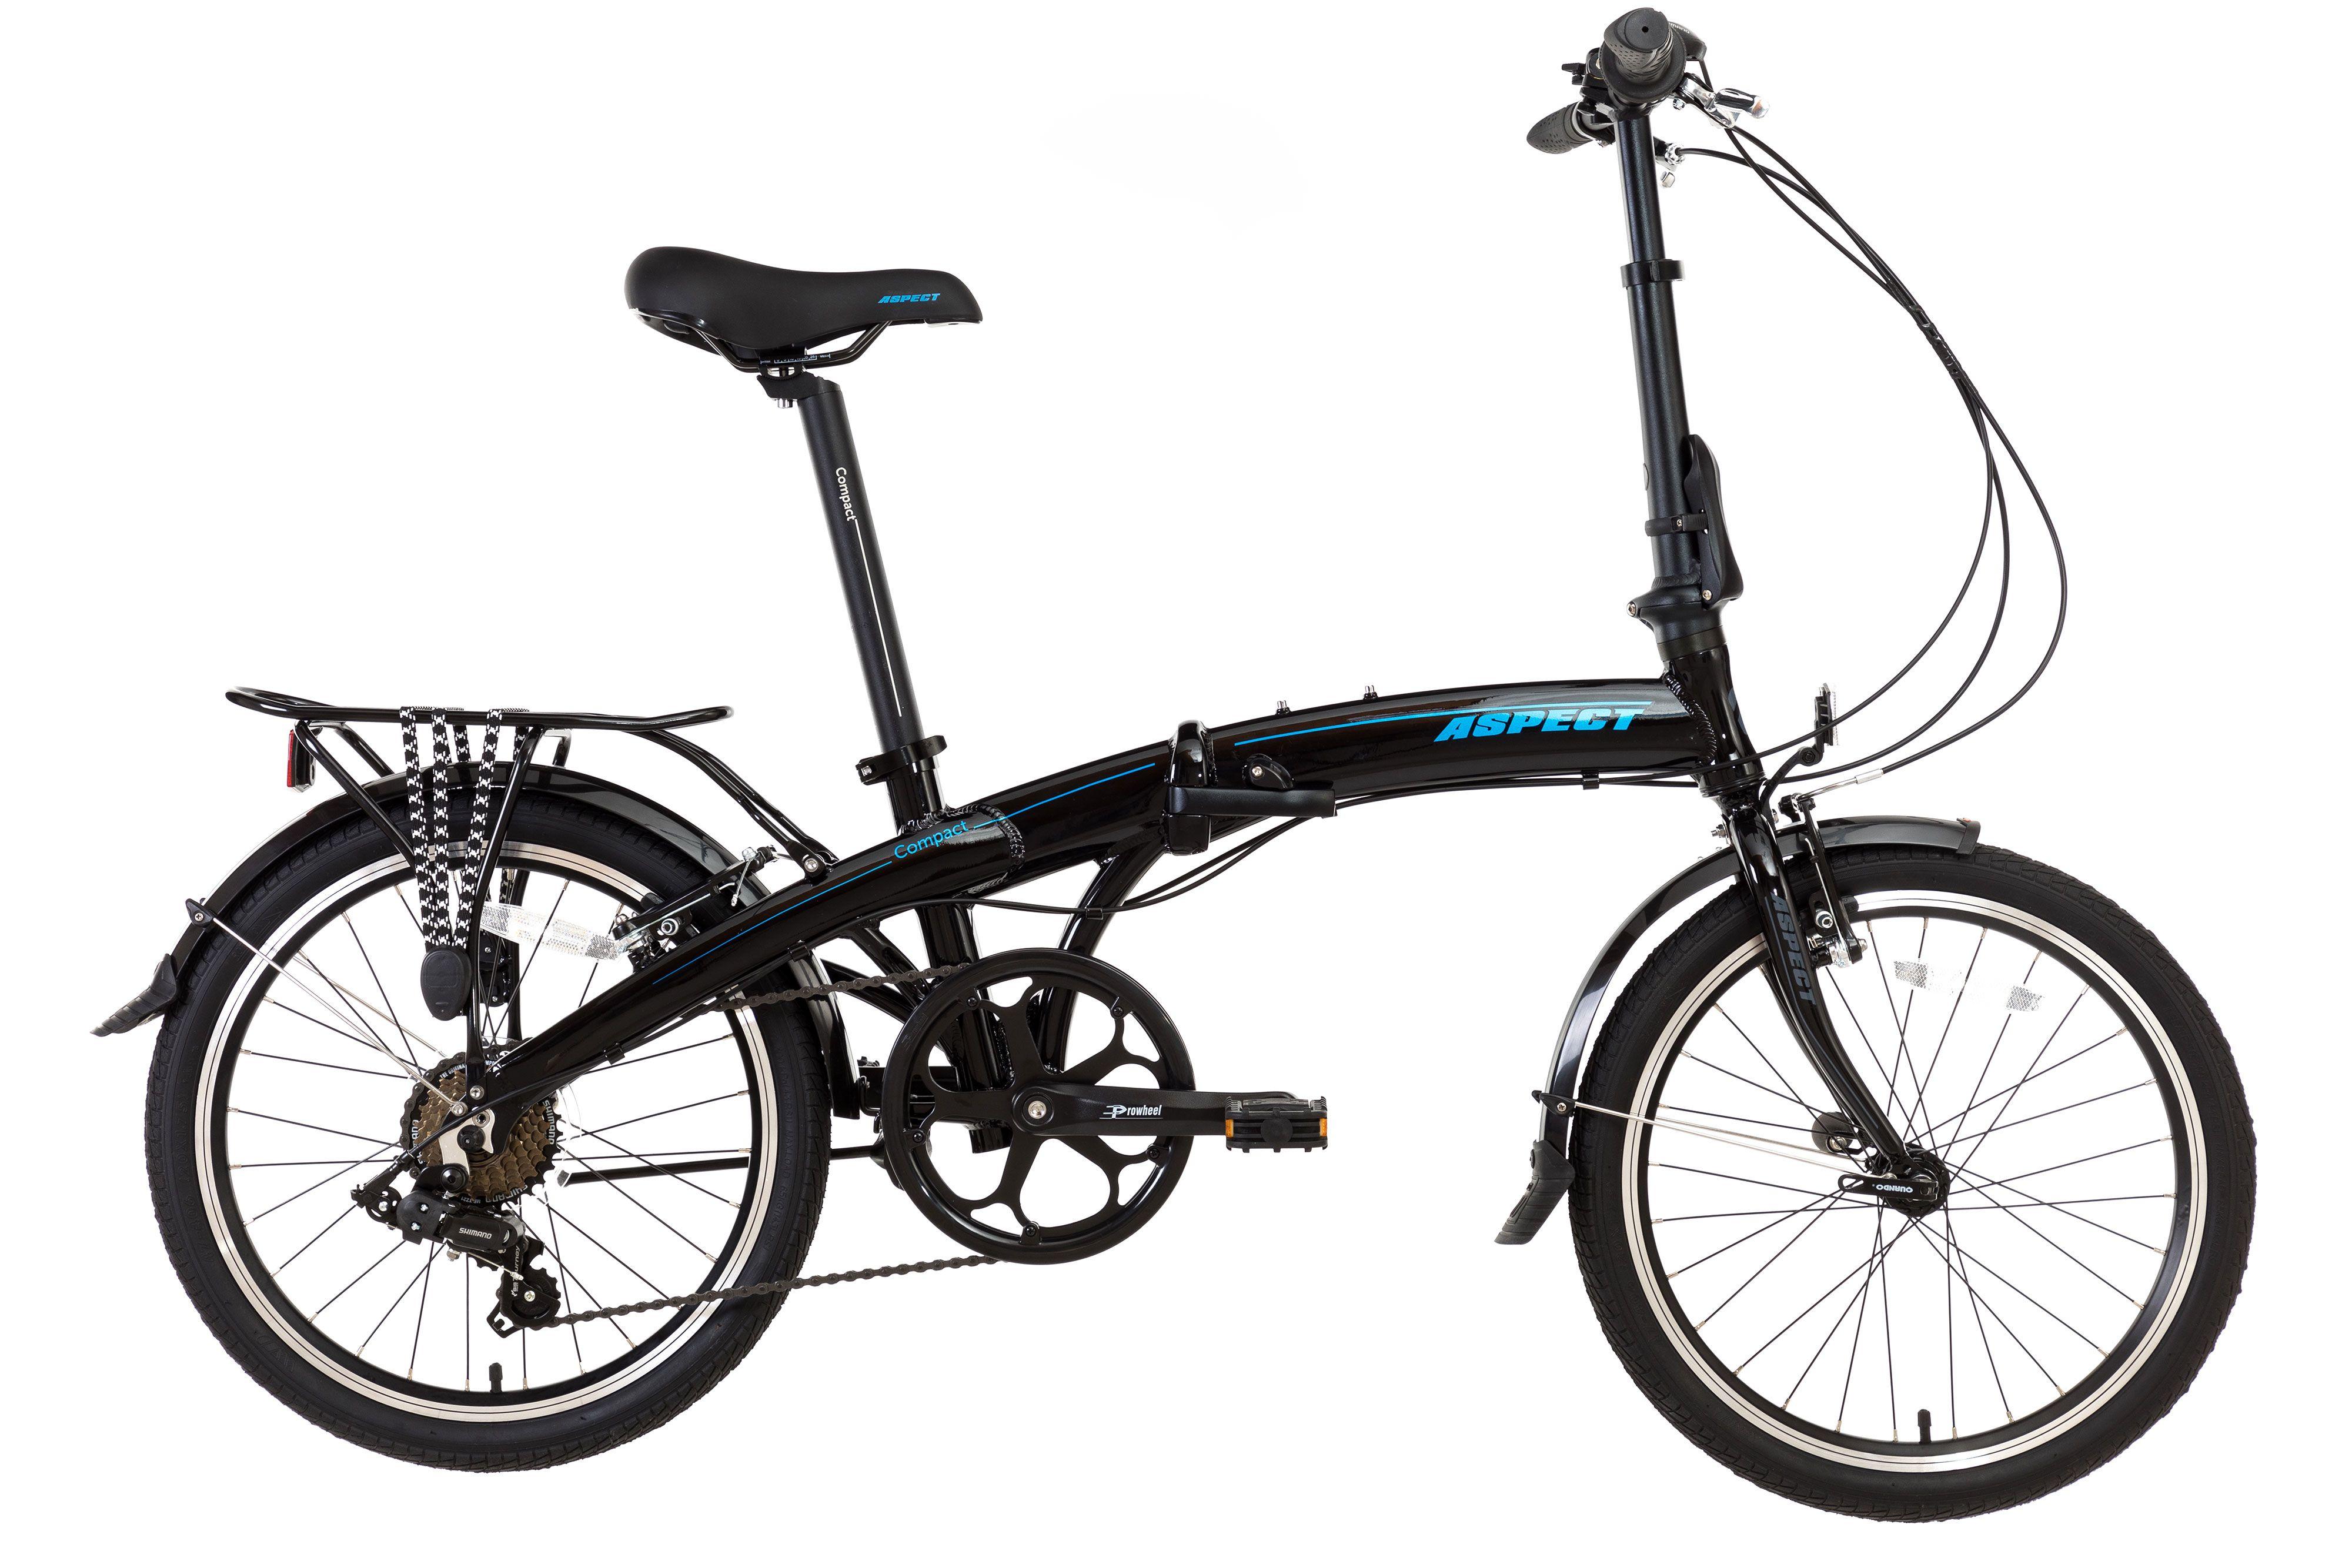 Велосипед Aspect Compact 2017,  Складные  - артикул:268881